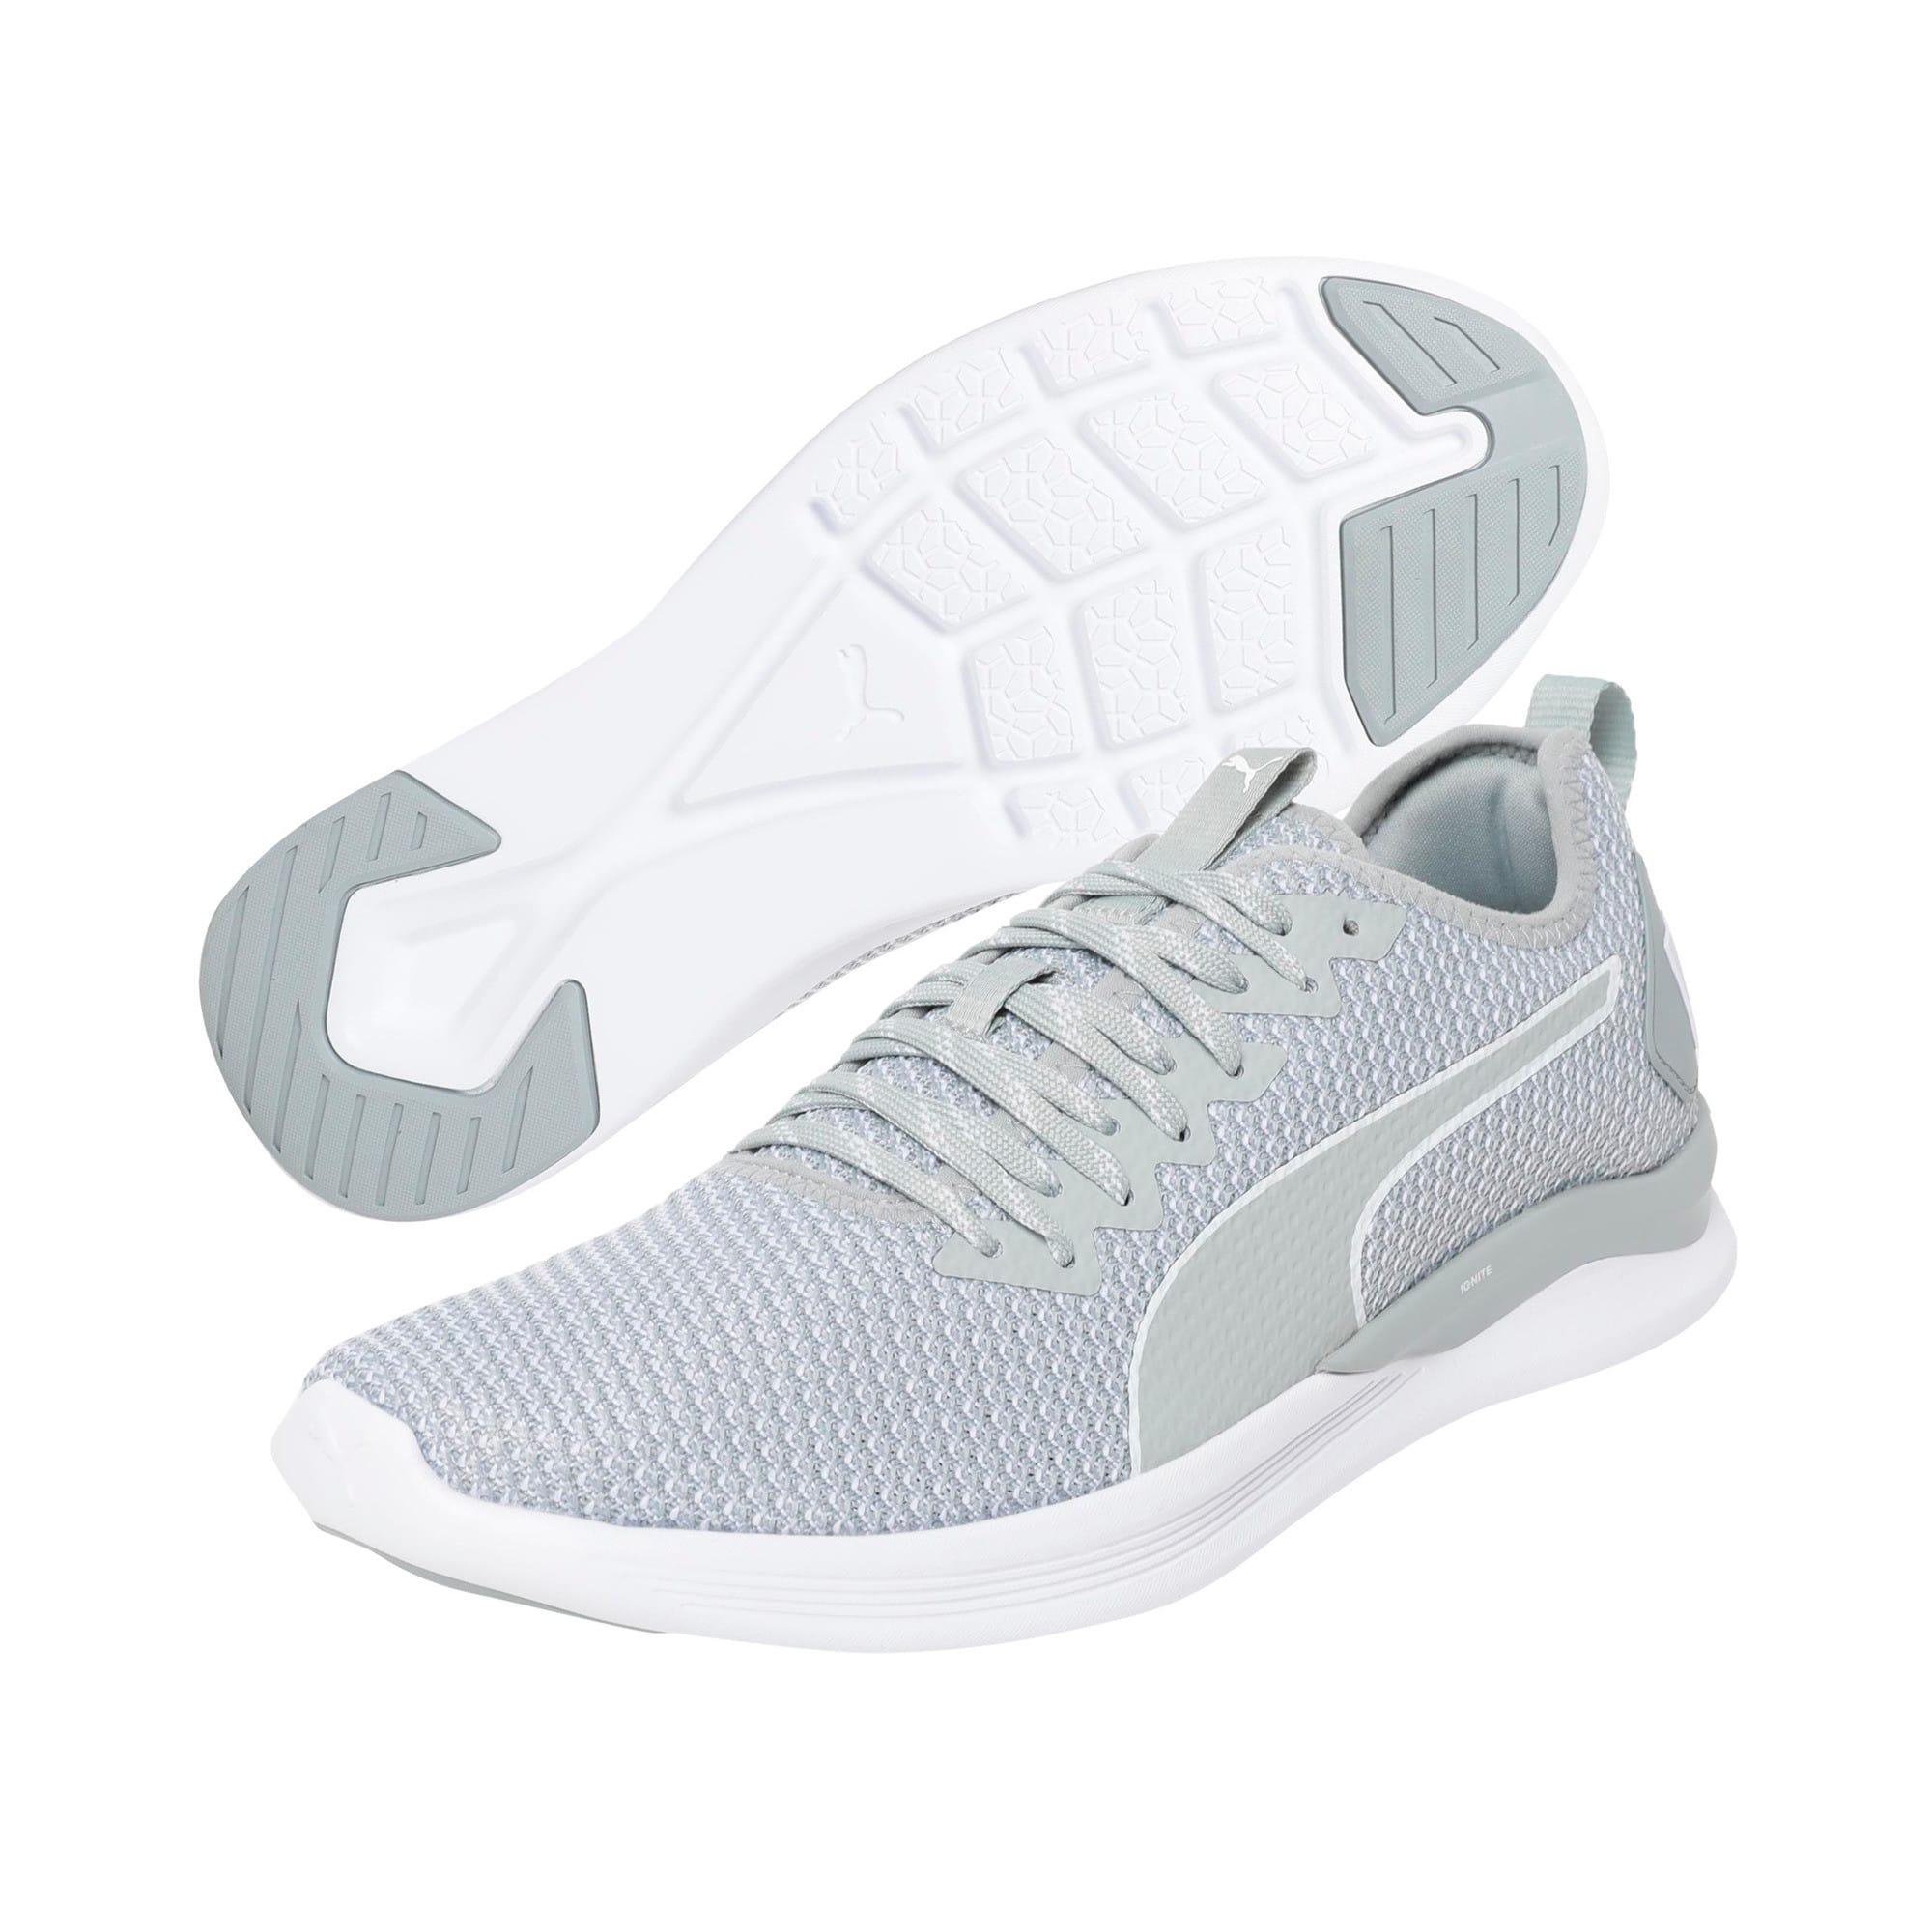 Thumbnail 2 of IGNITE Flash FS Men's Running Shoes, Quarry-Puma White, medium-IND